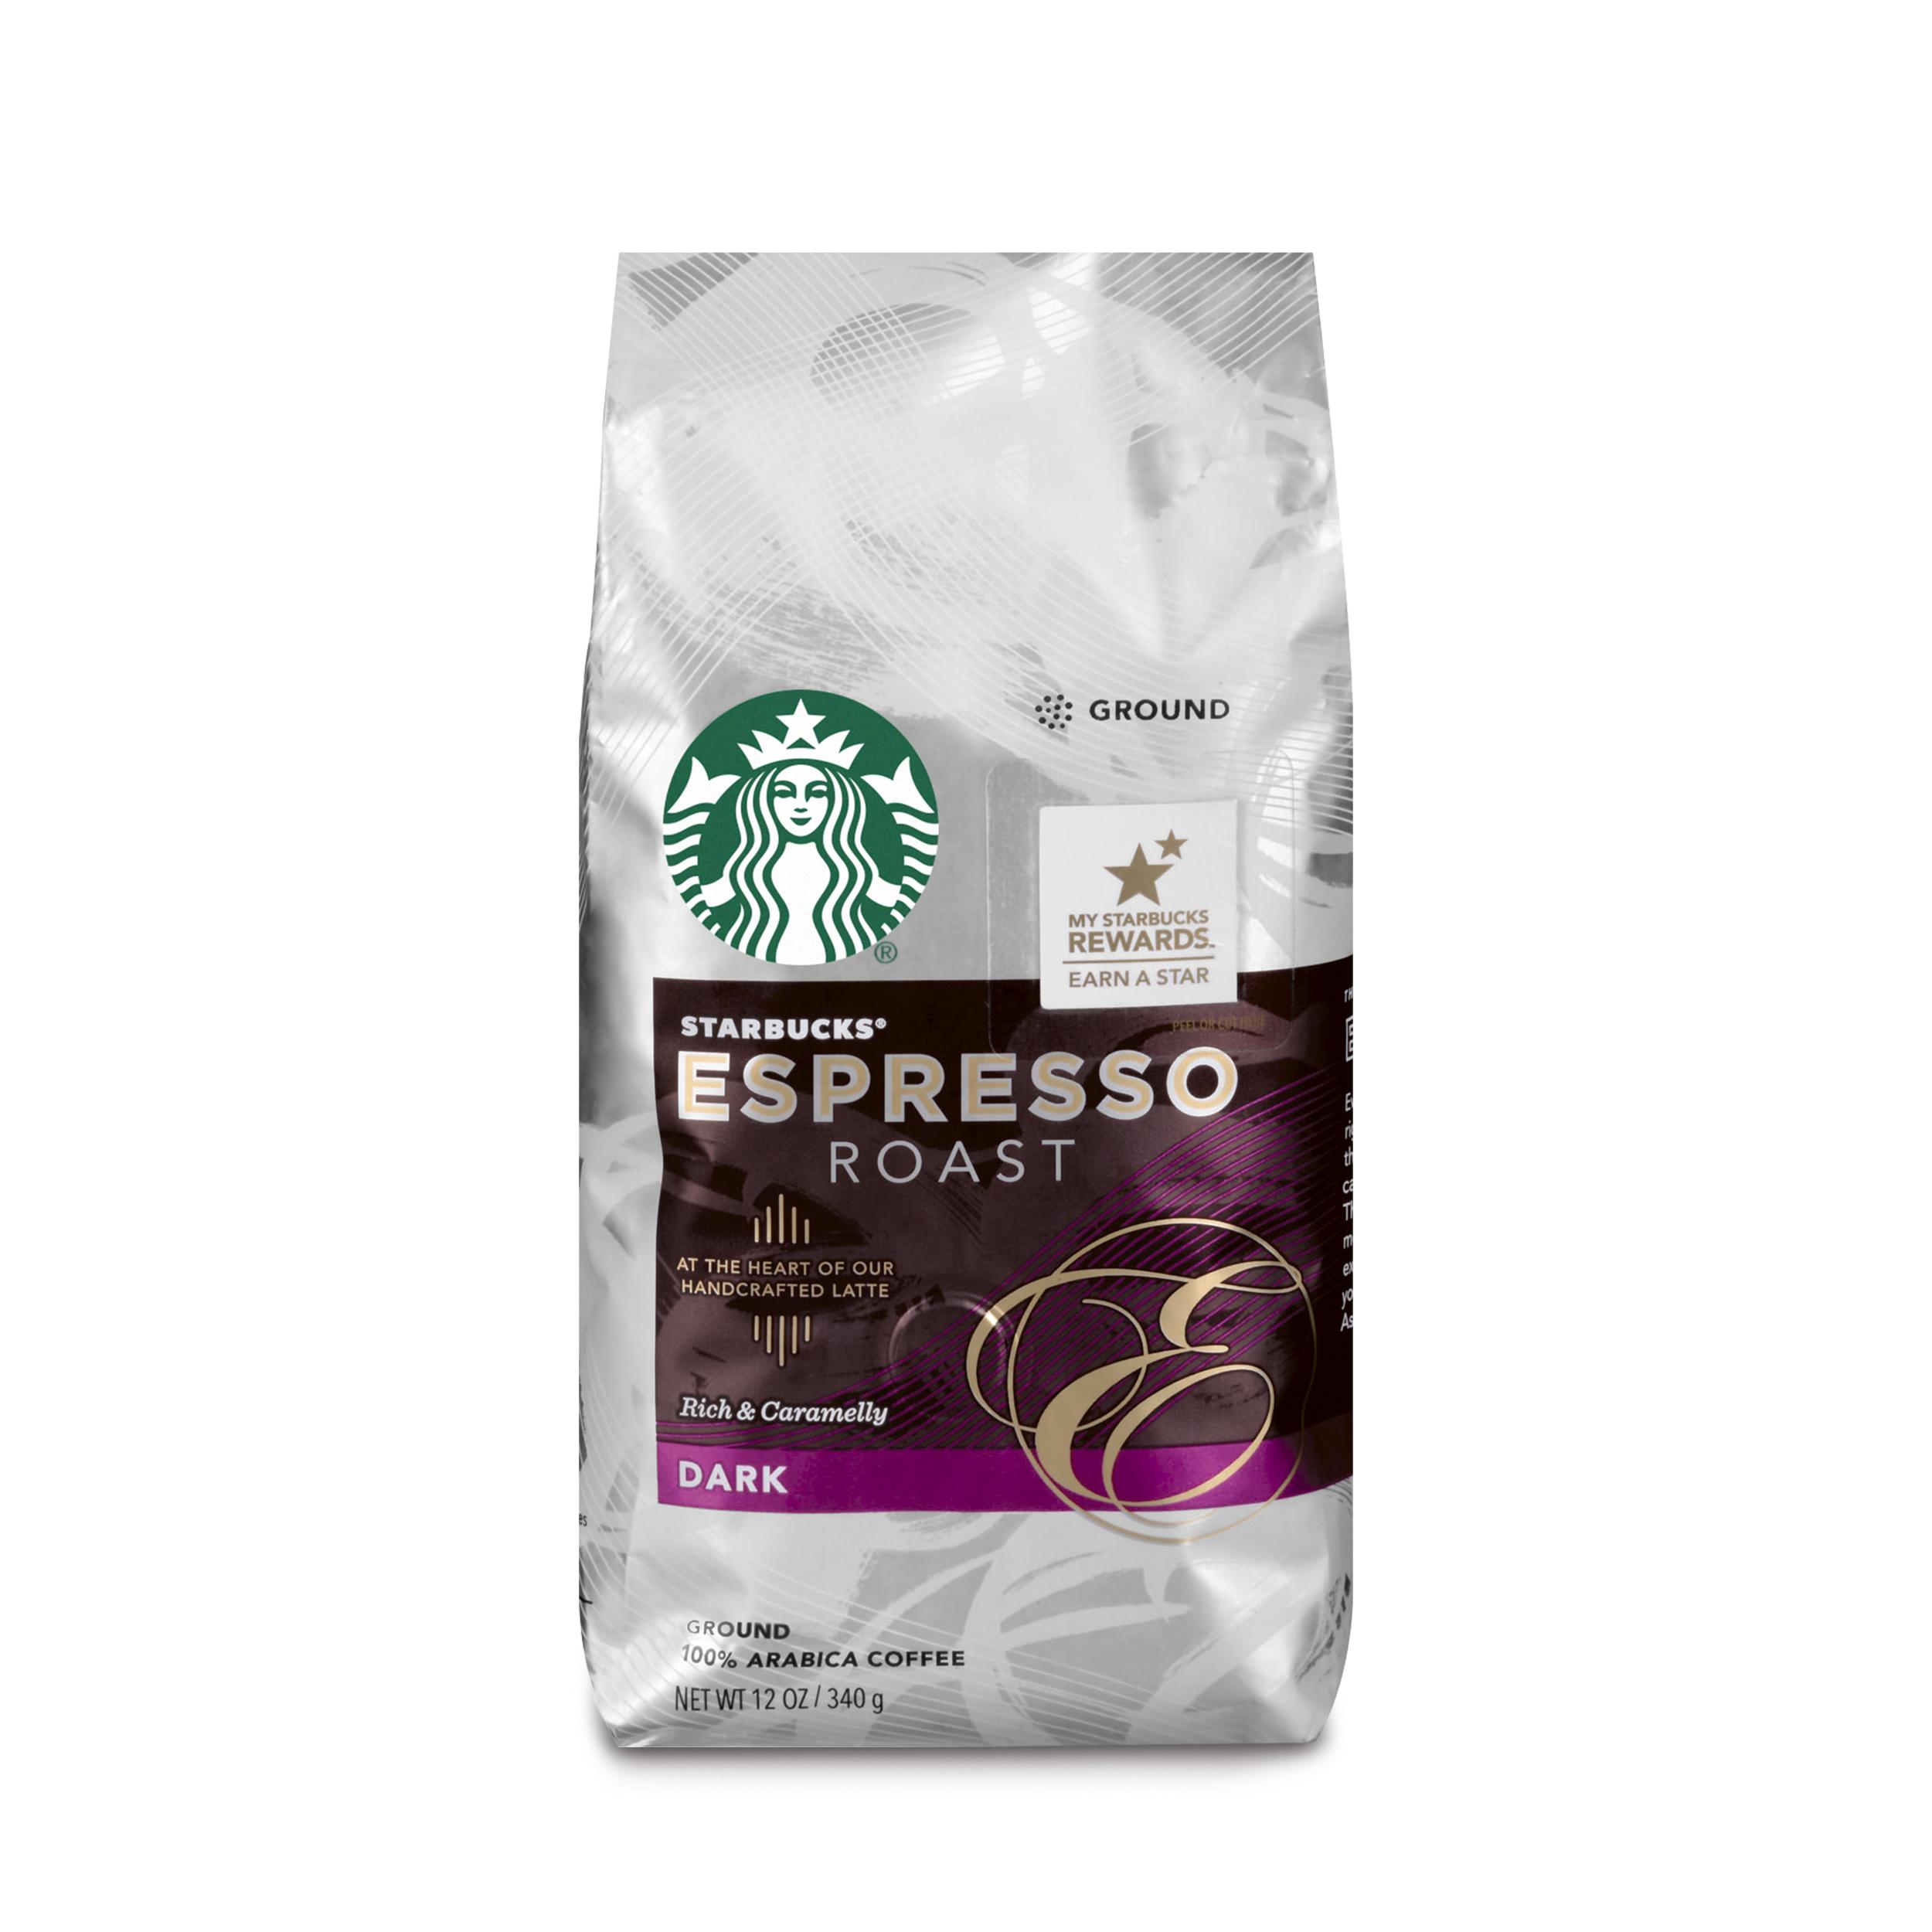 Starbucks Espresso Roast Dark Roast Ground Coffee, 12-Ounce Bag